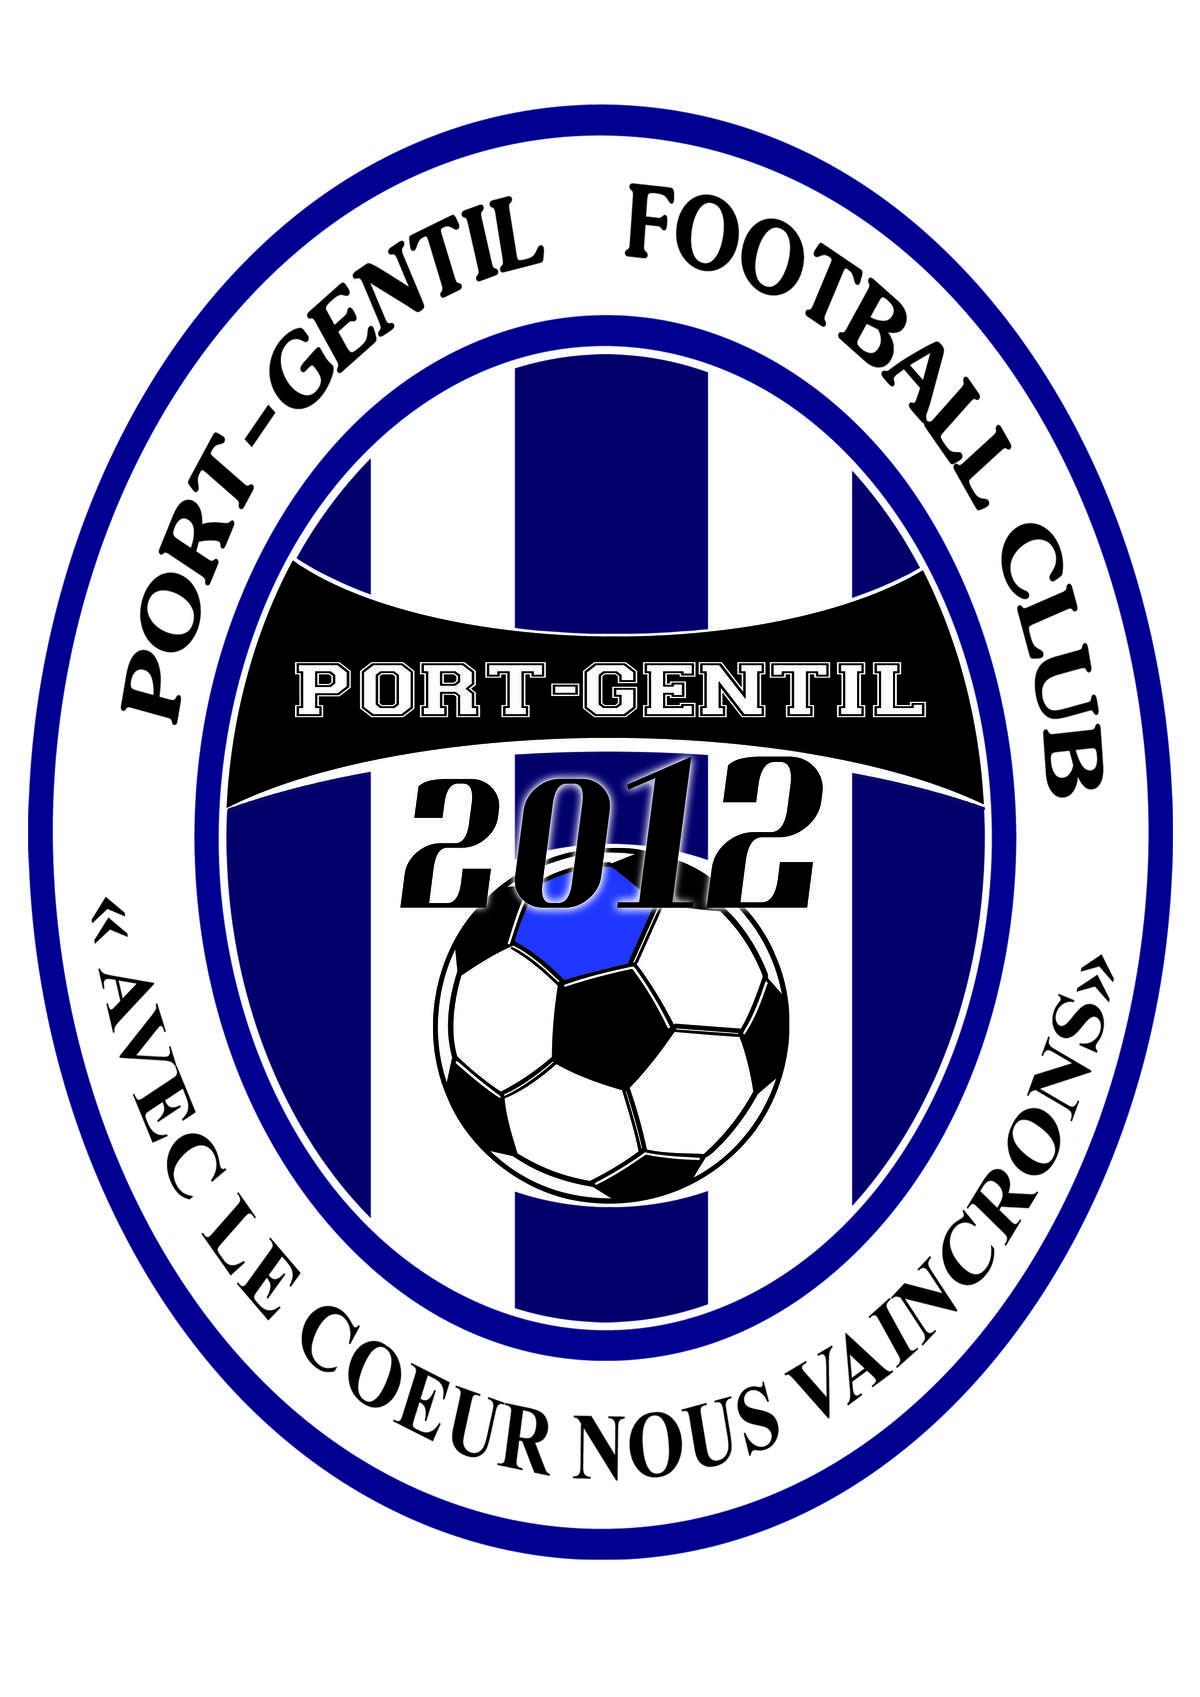 Port-Gentil Football Club